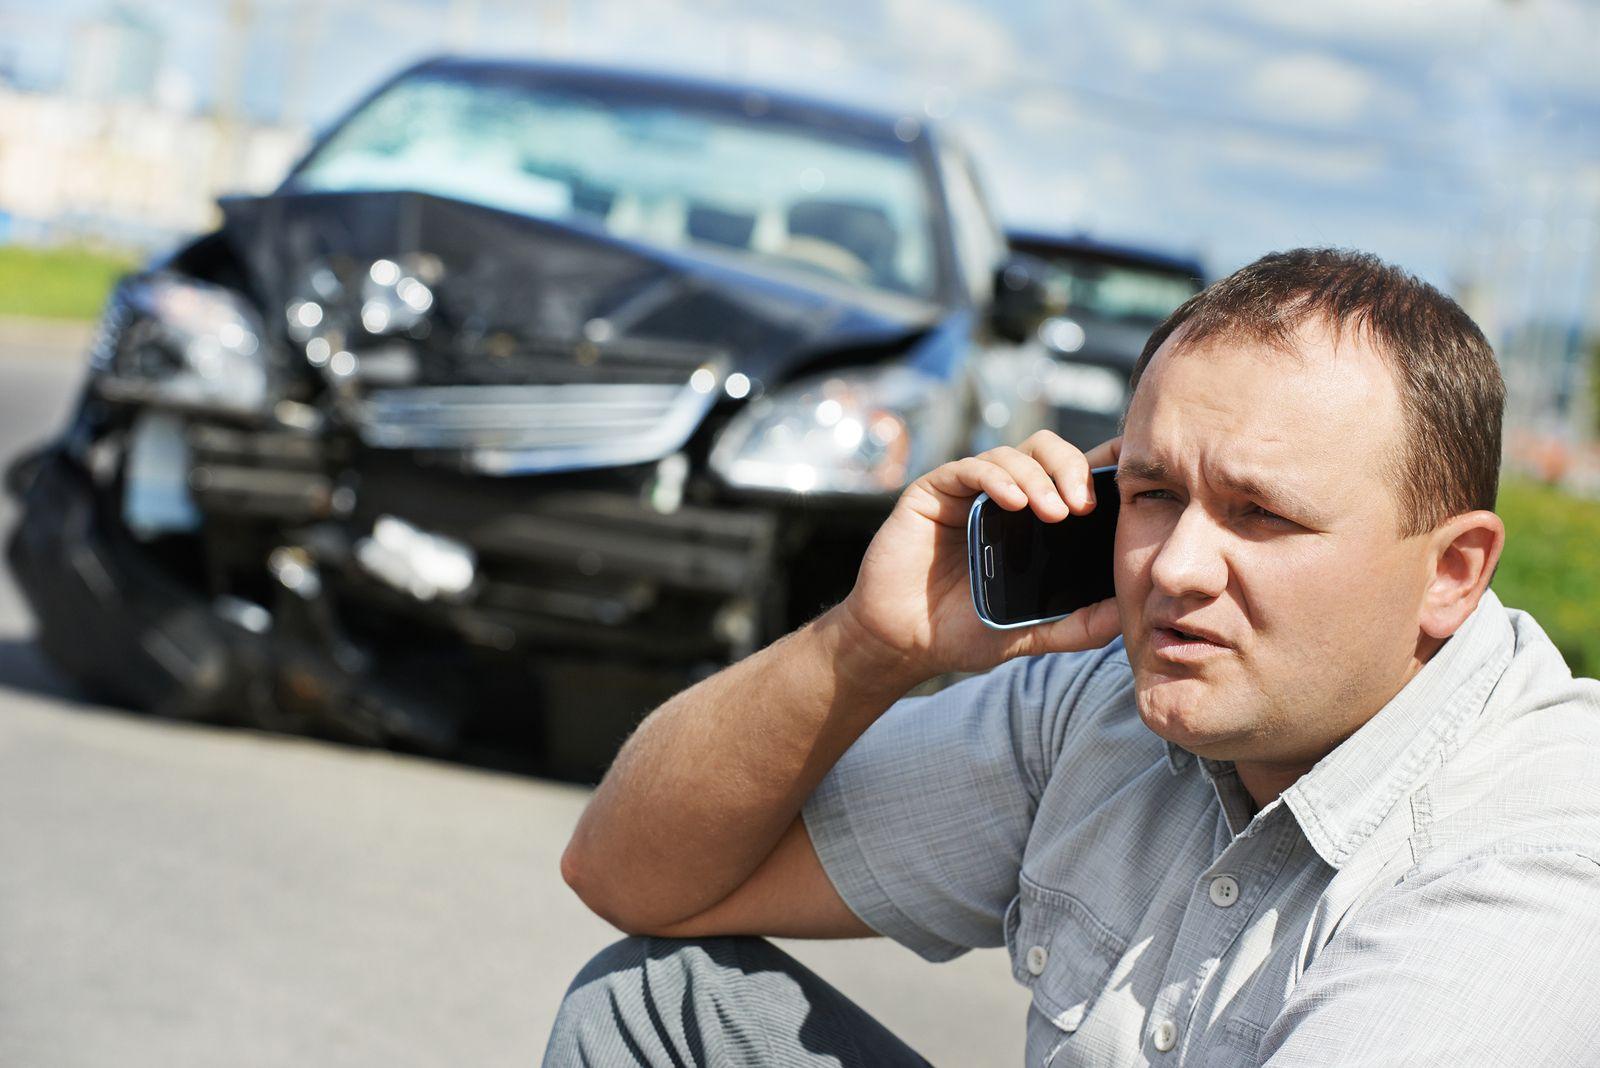 How to make mobile mechanic effective and safe option